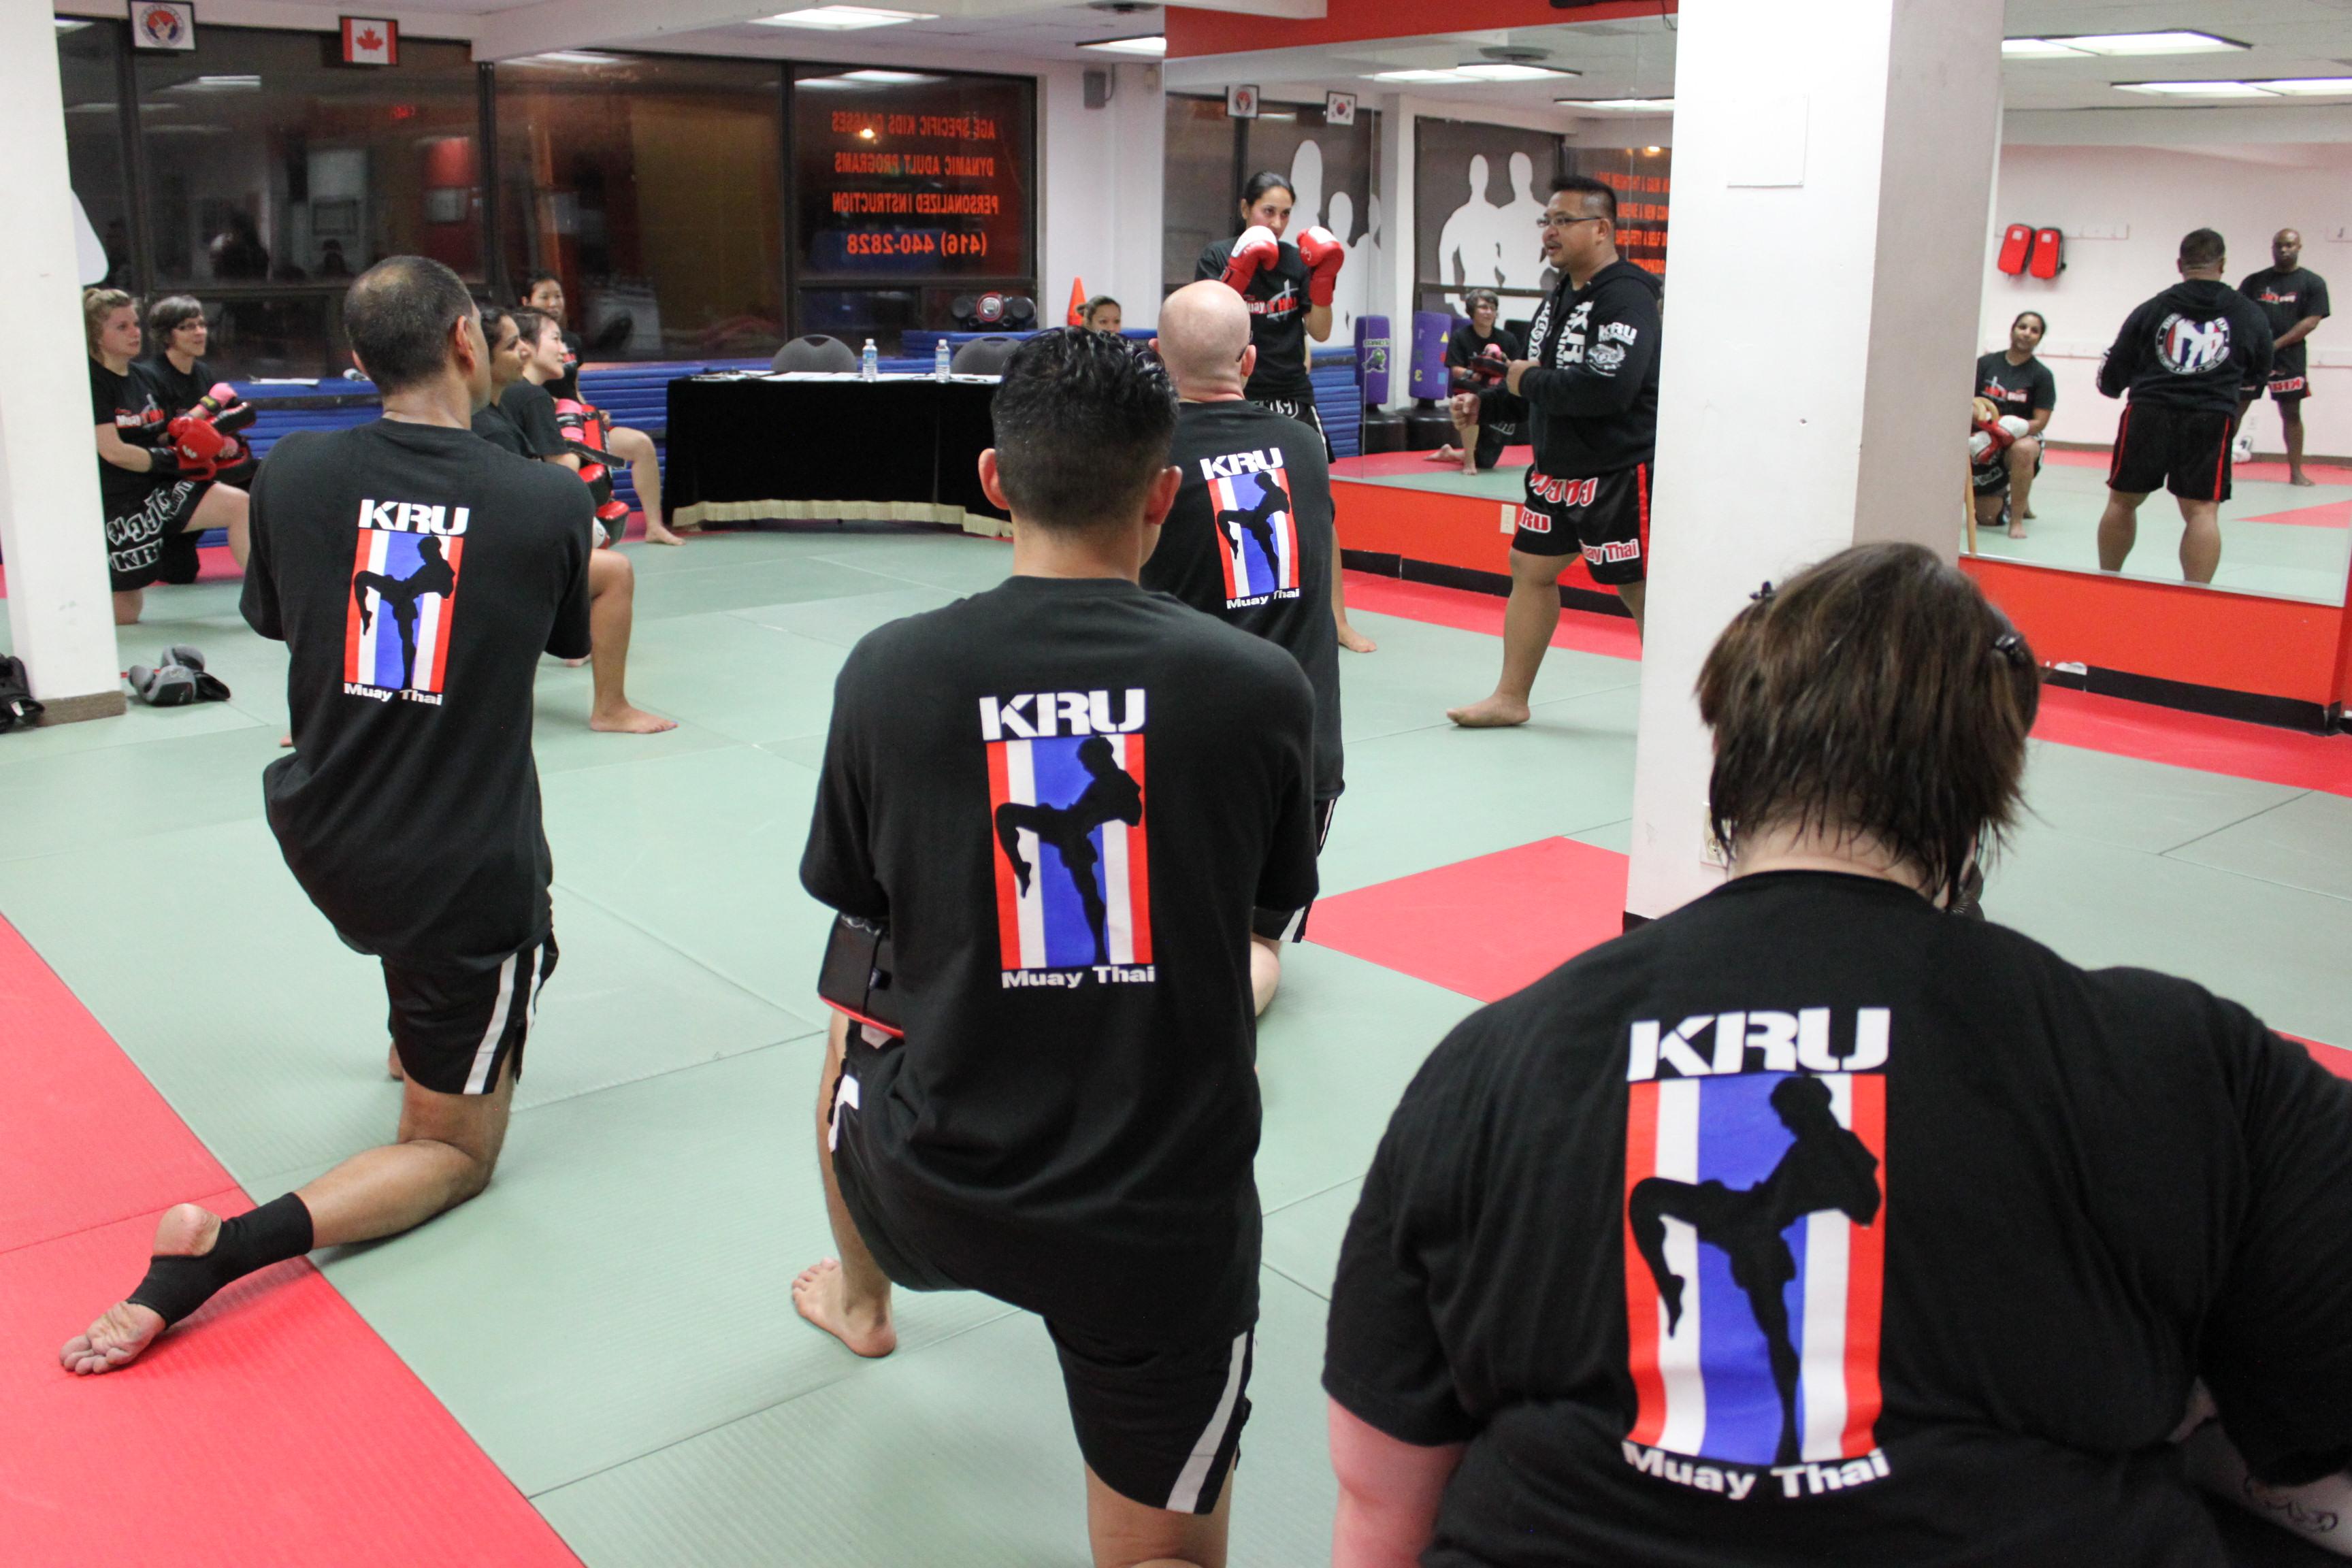 Toronto Muay Thai class for beginners